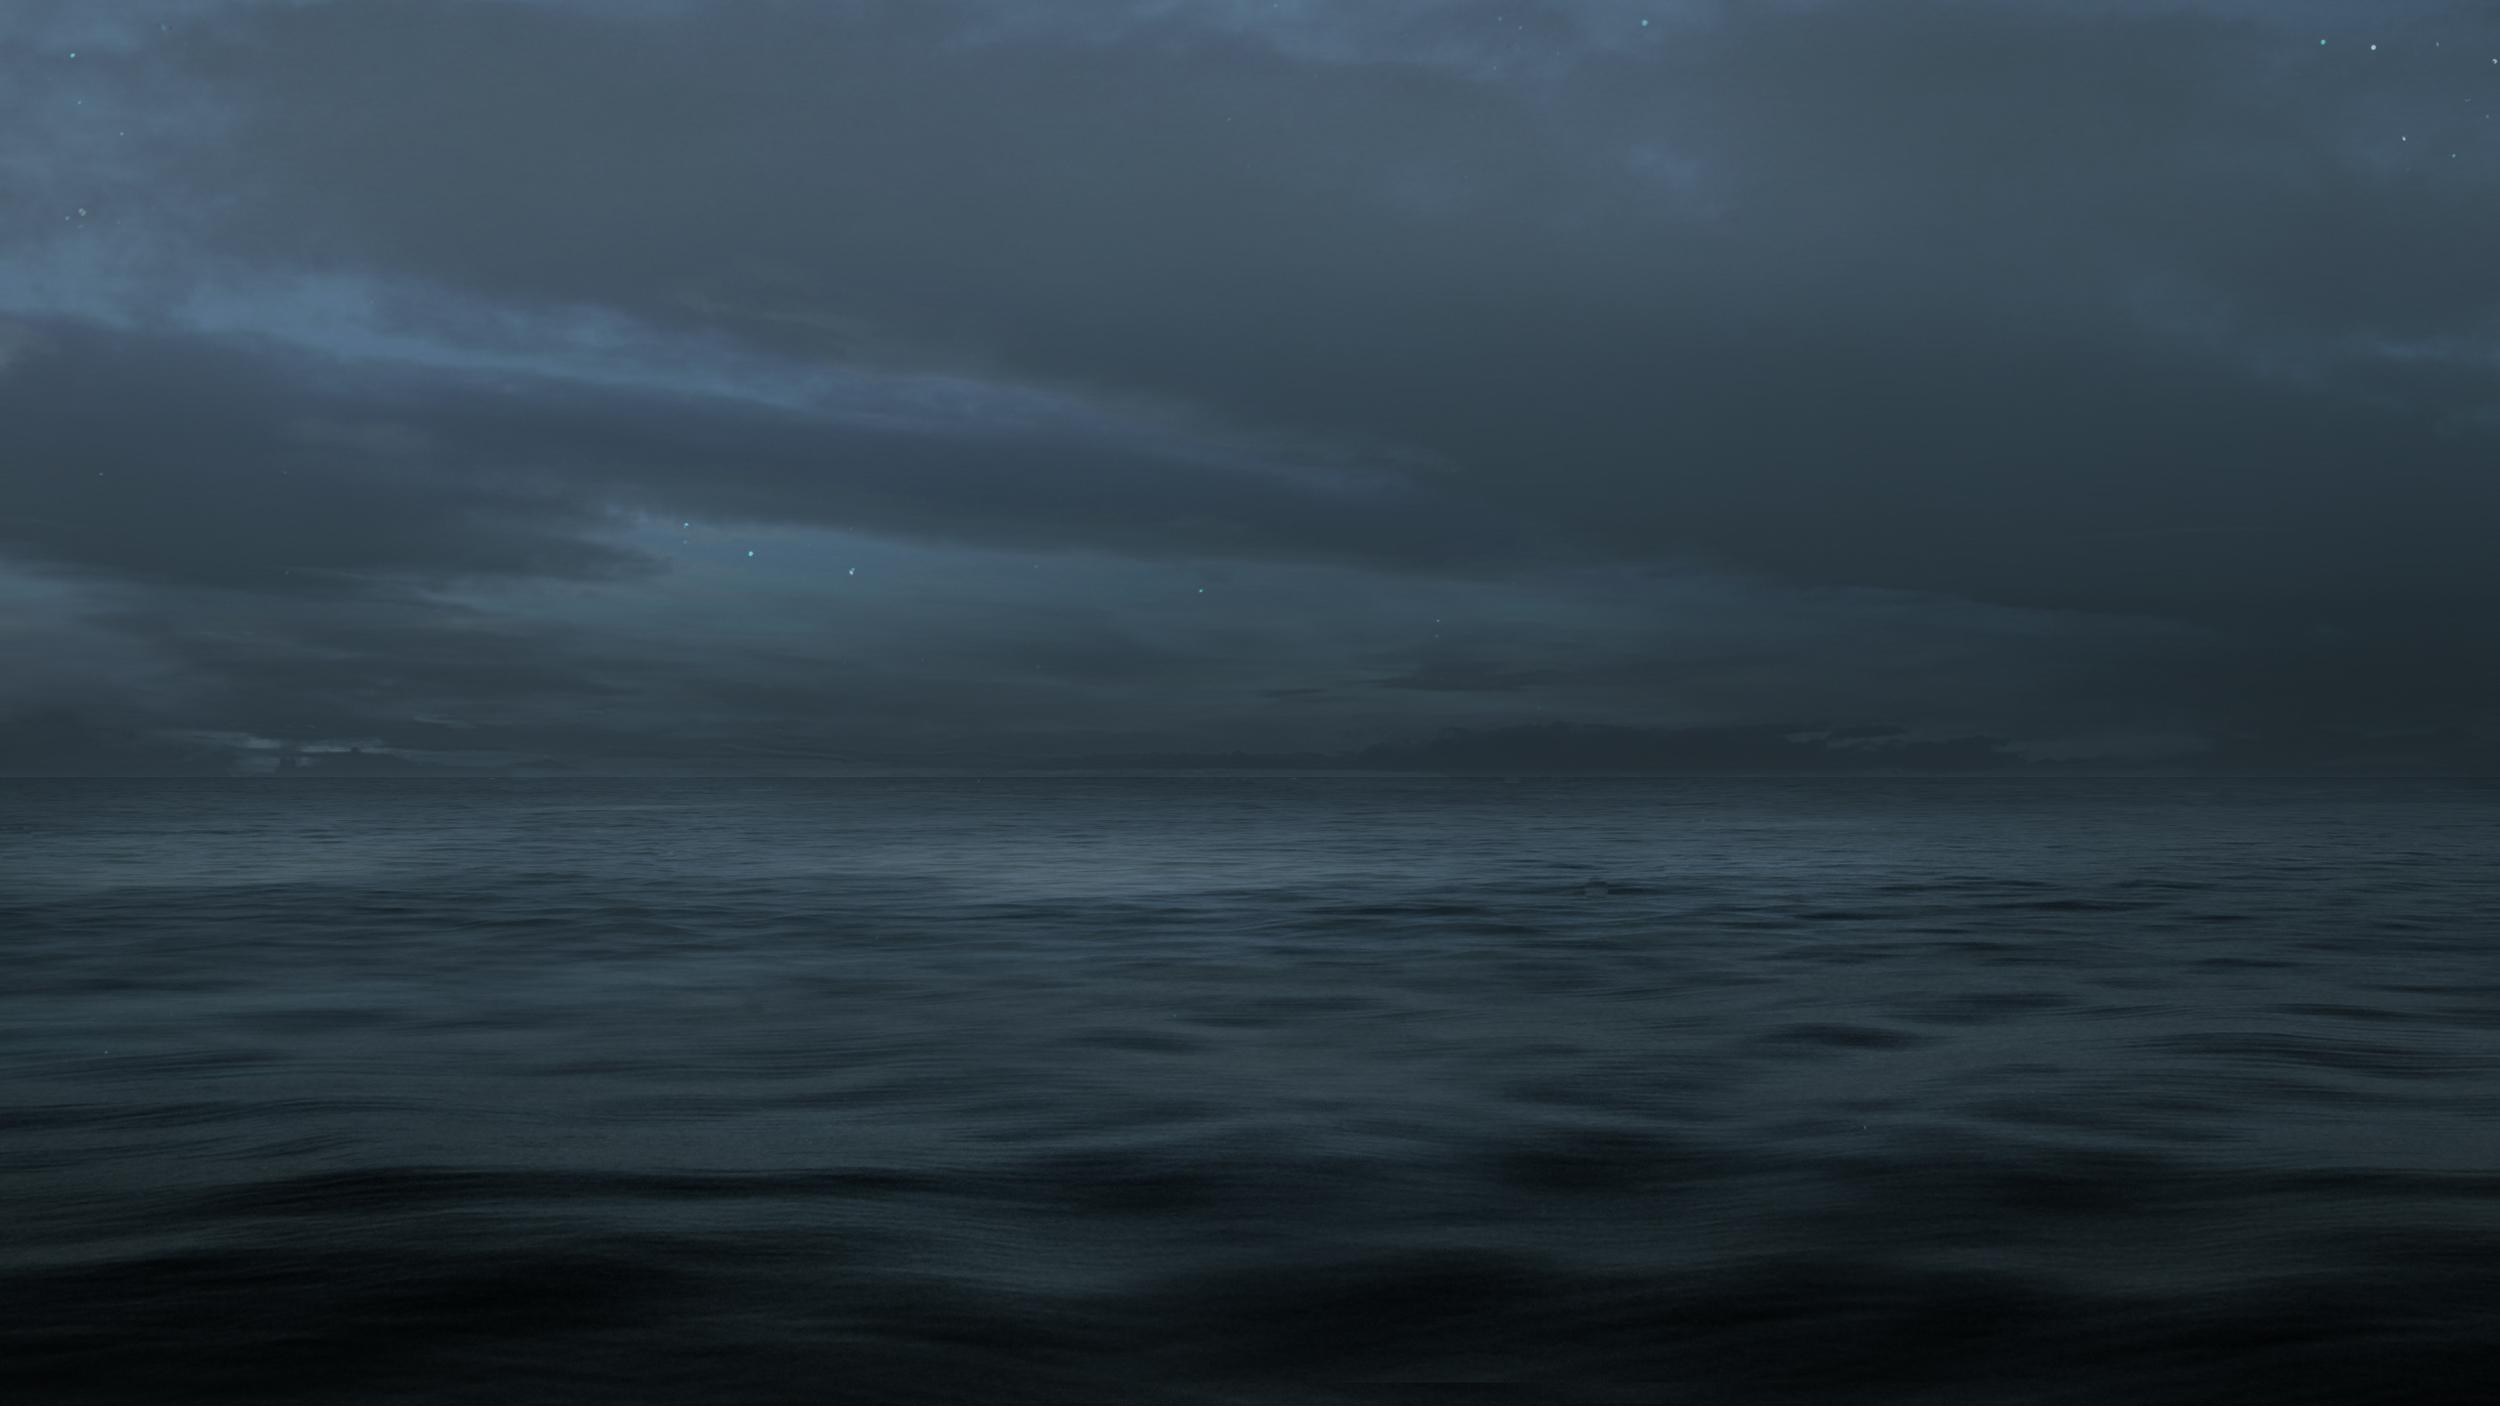 sea_at_dusk.jpg